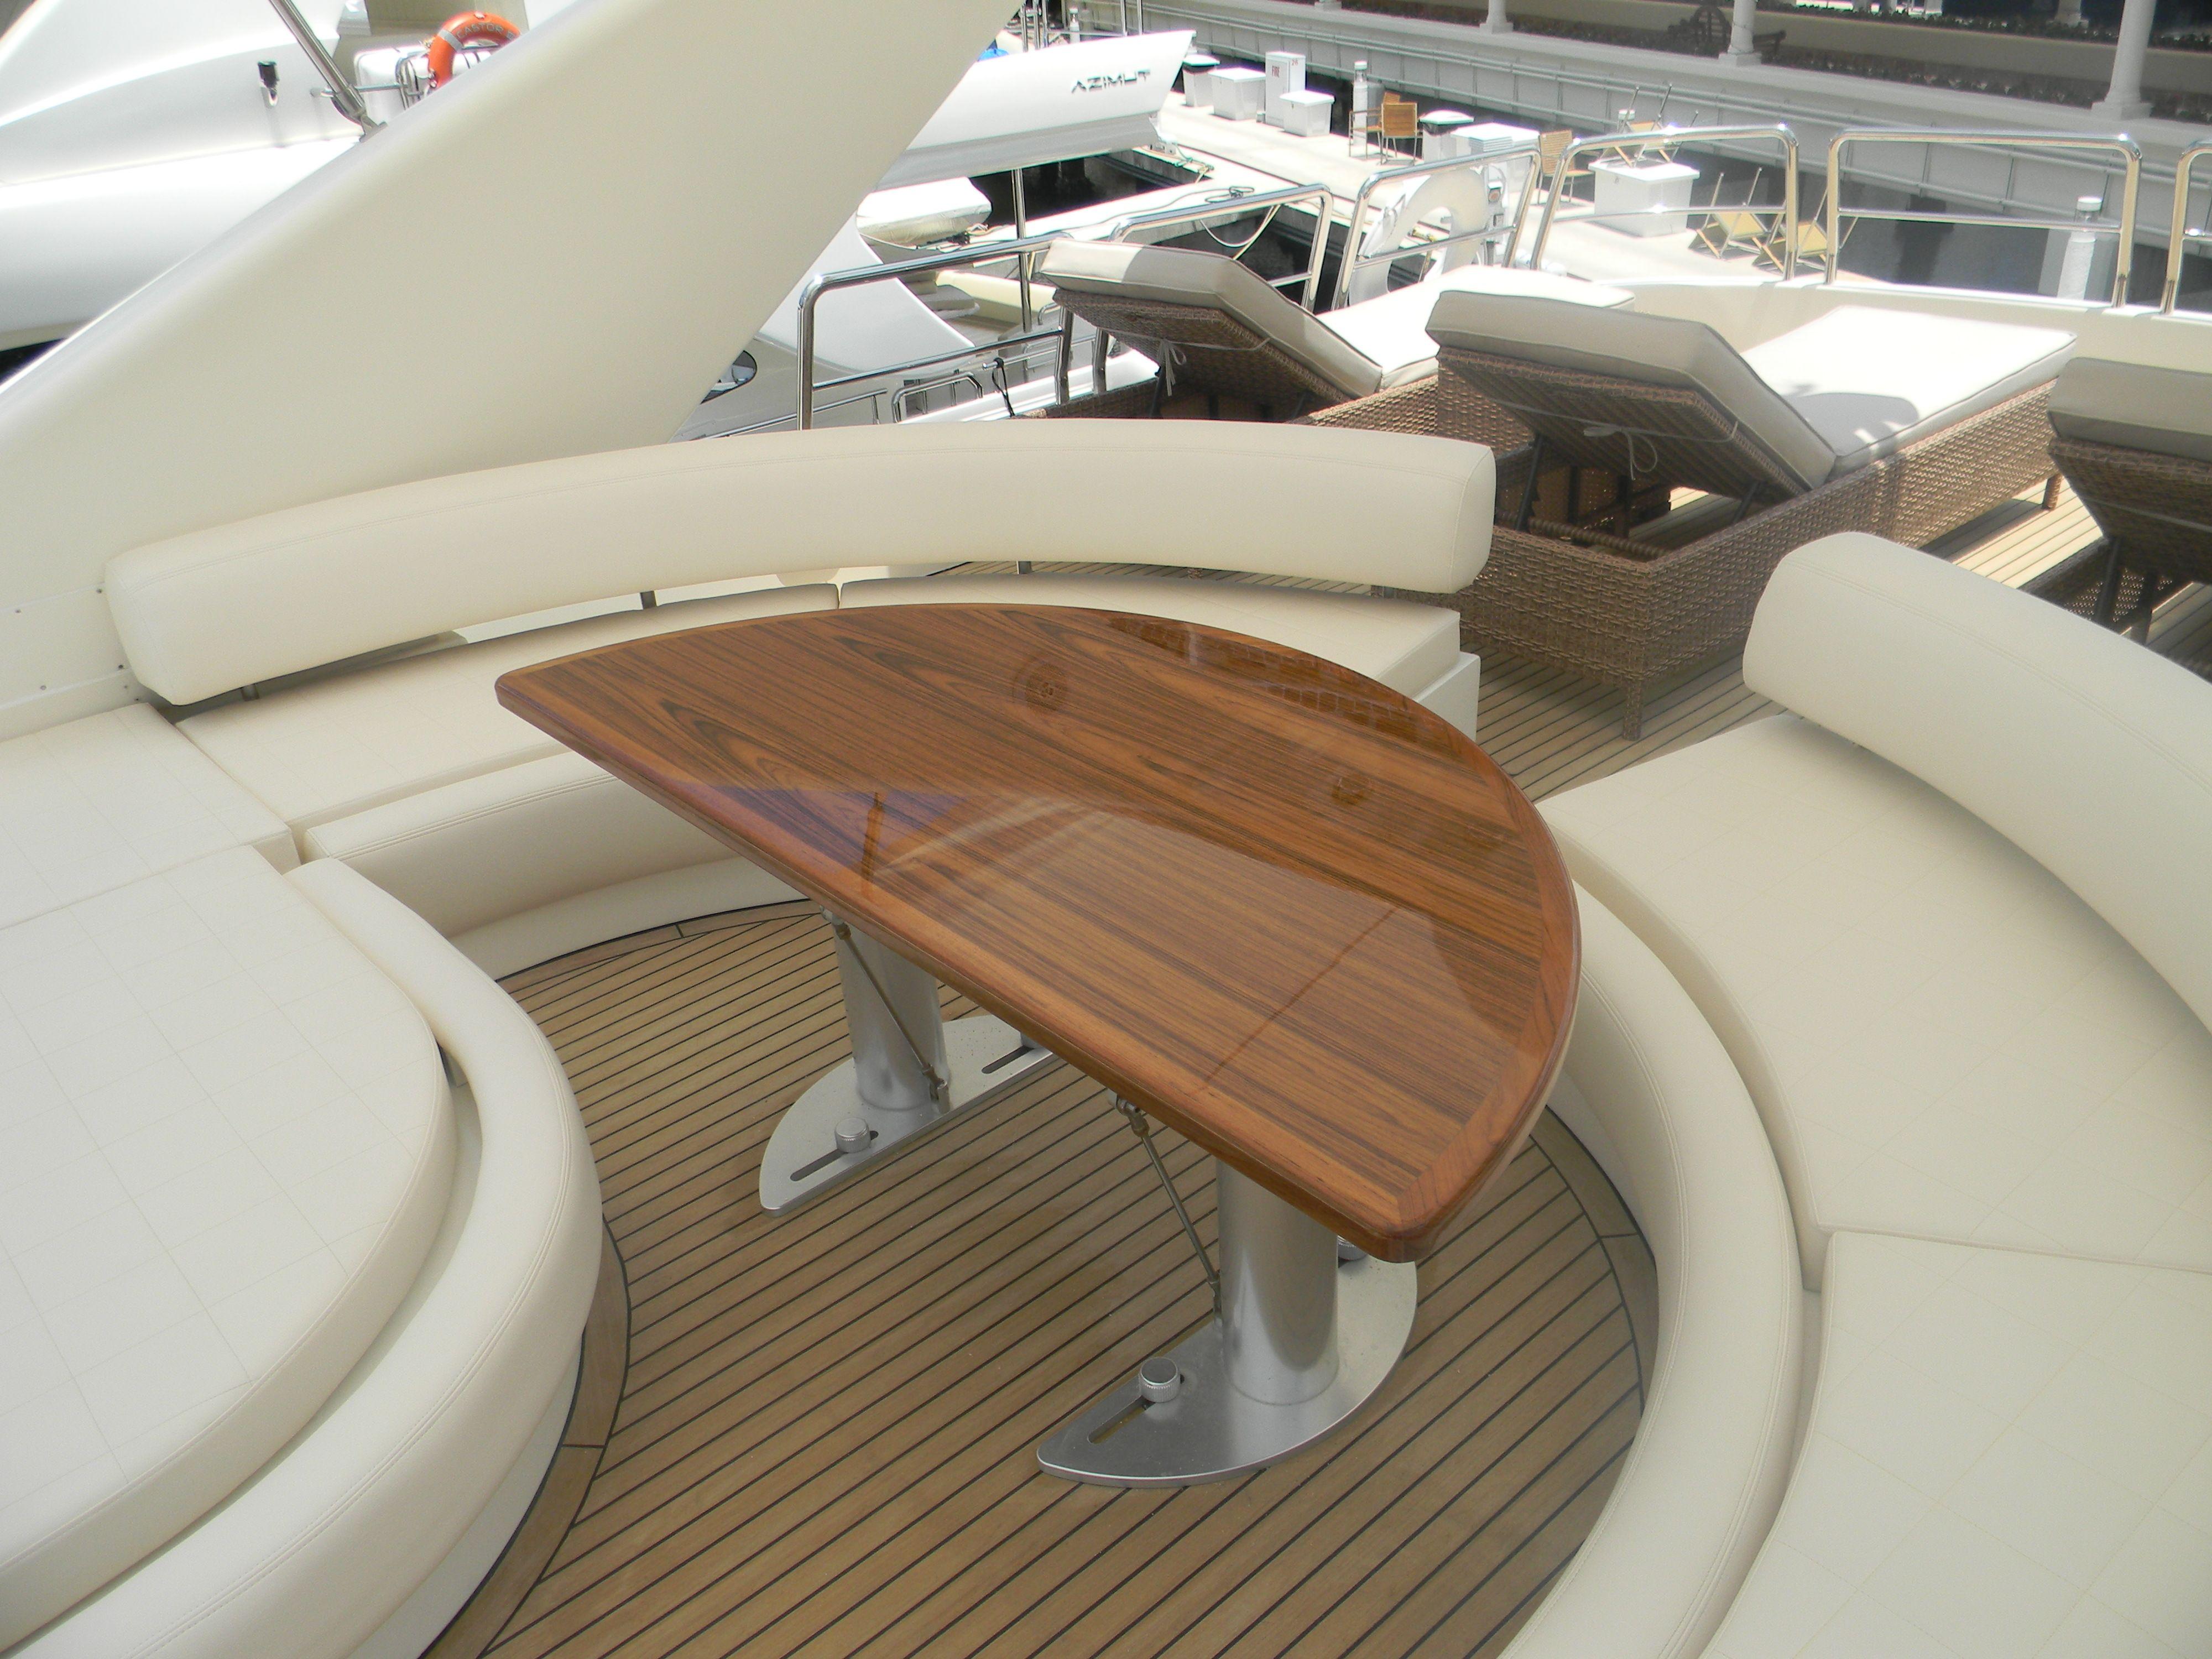 photo flooring floor wood x amtico superior by att florida of lauderdale carpentry marine custom boat interior fort